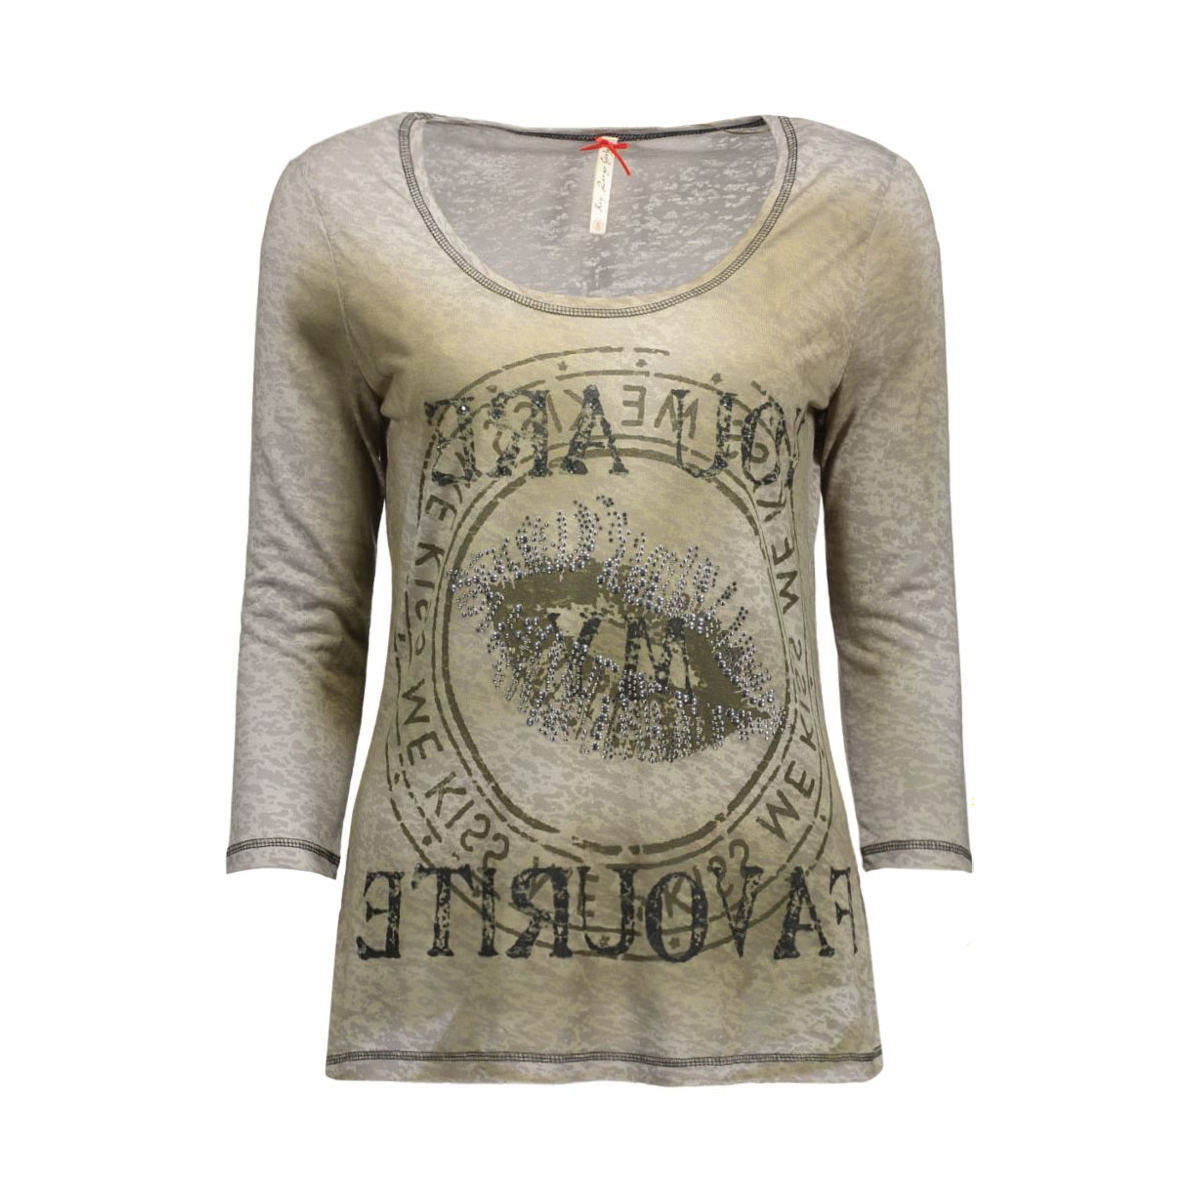 dls00238 key largo t-shirt khaki